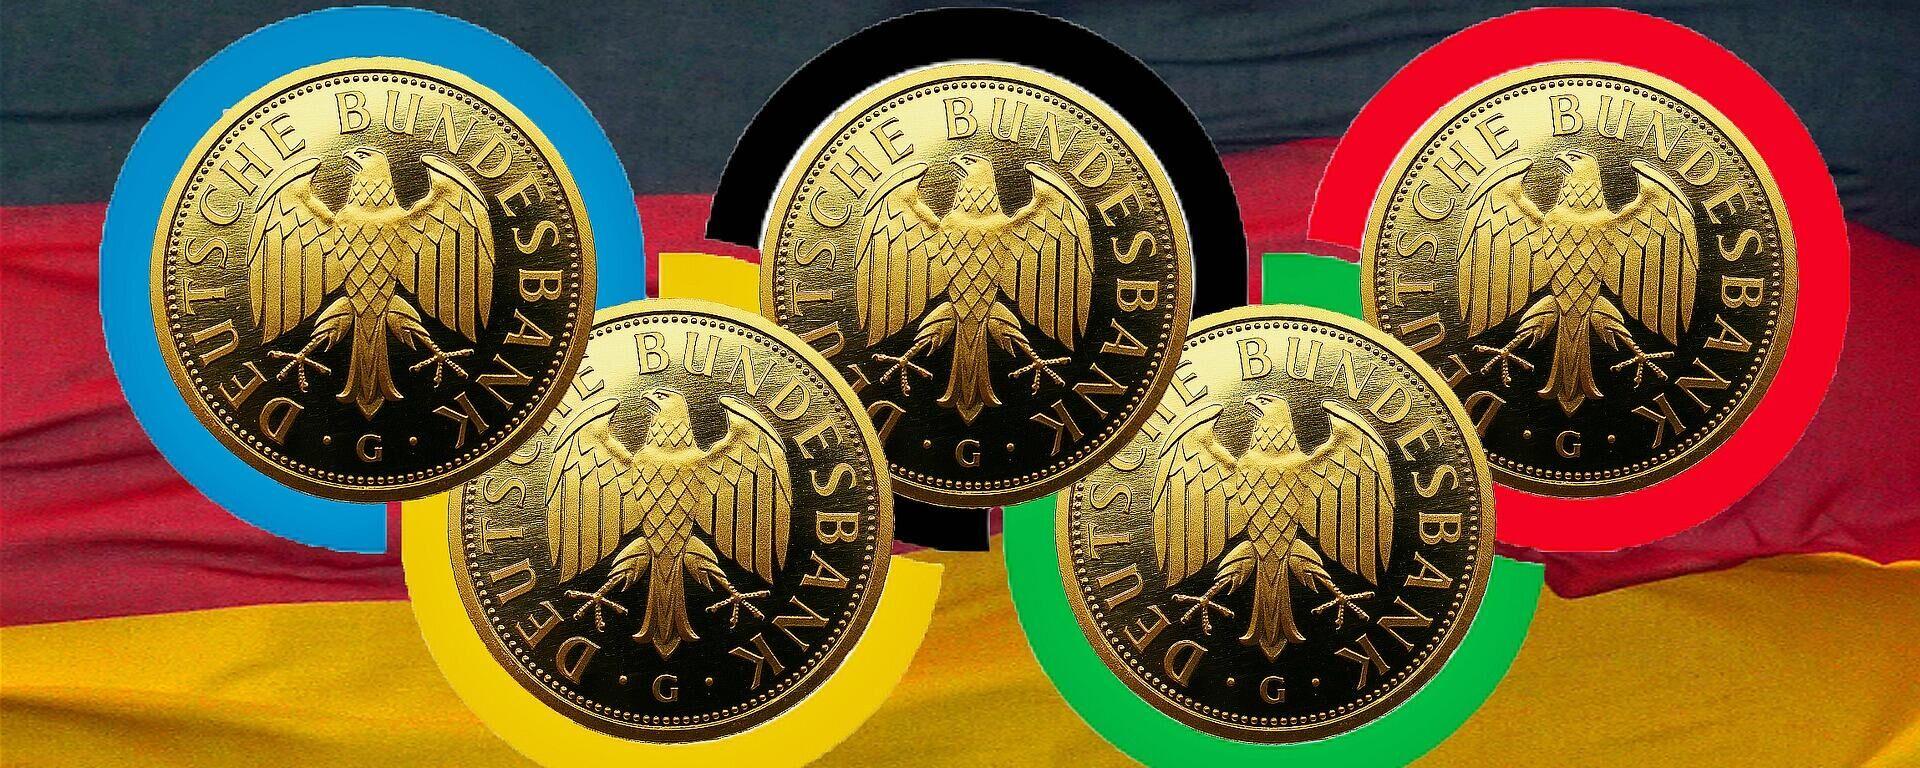 Olympia-Medaillen (Symbolbild) - SNA, 1920, 23.07.2021